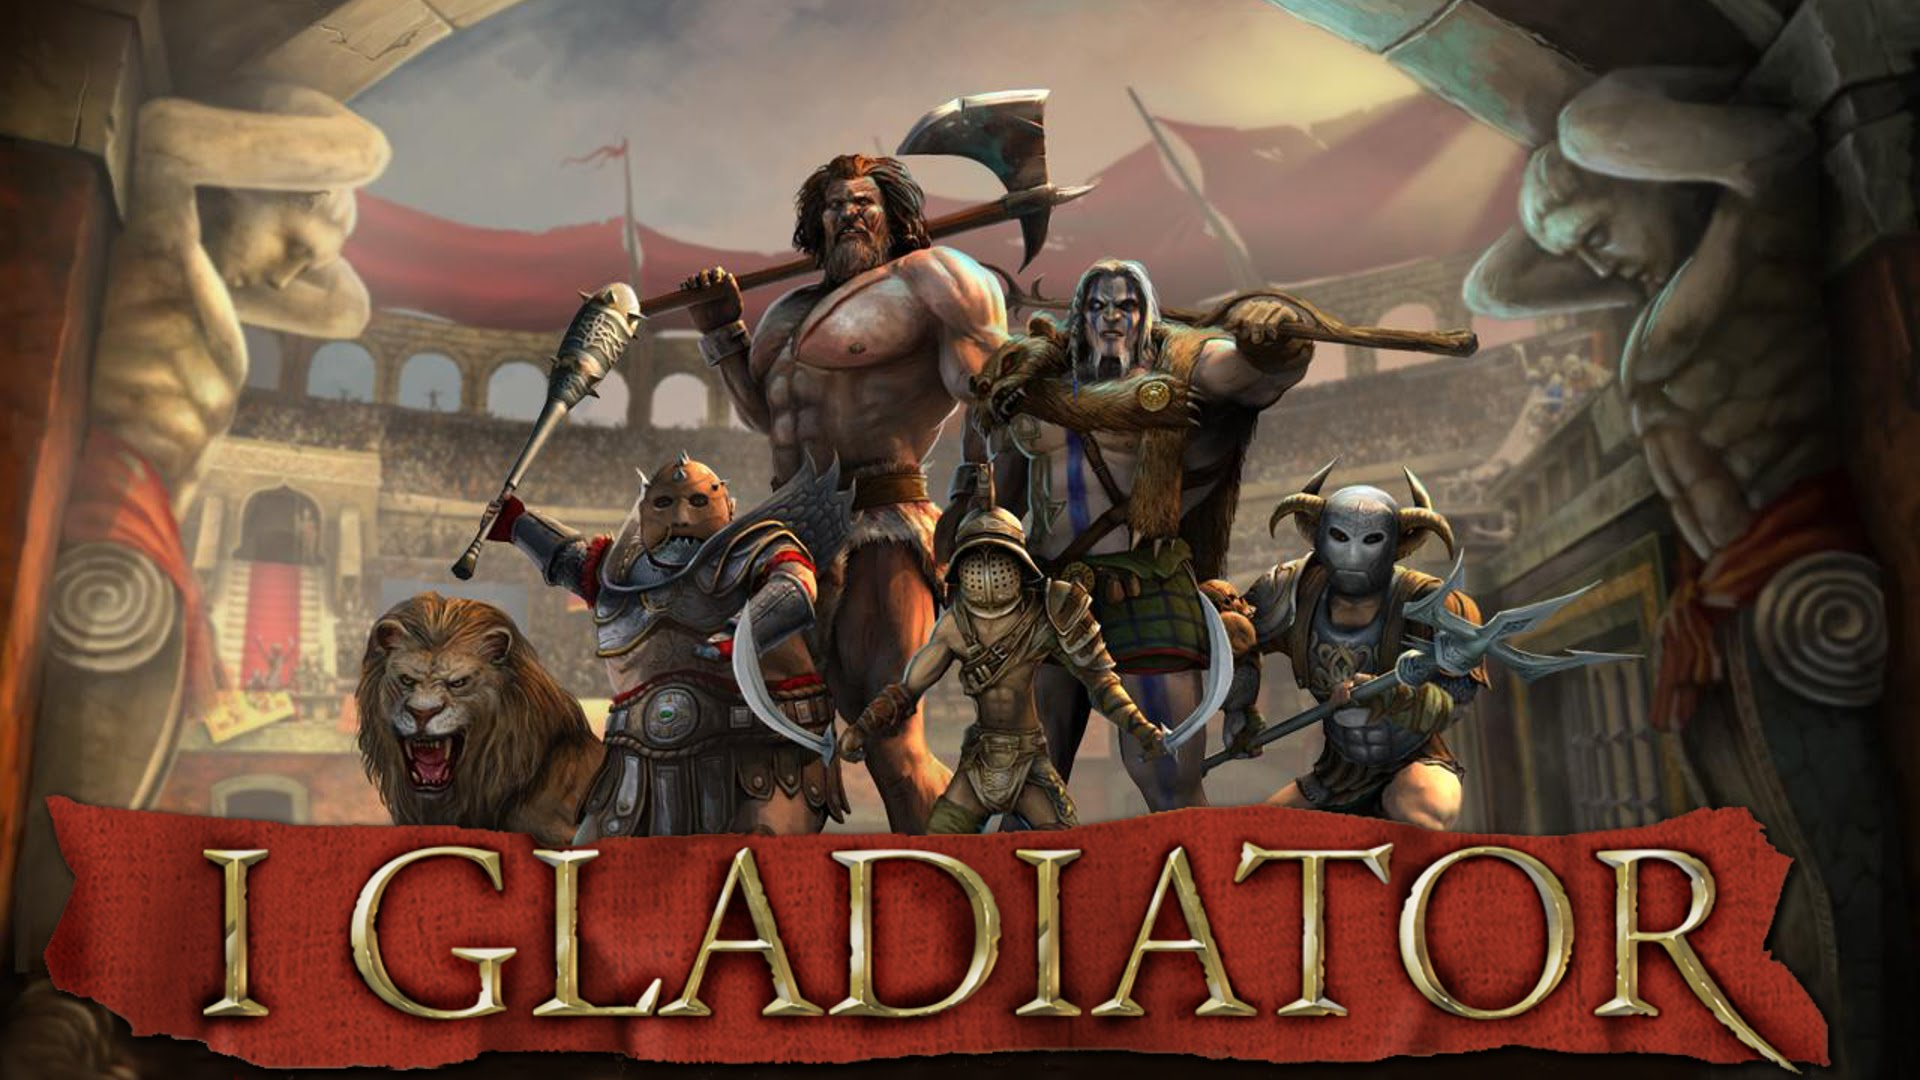 I, Gladiator HD wallpapers, Desktop wallpaper - most viewed